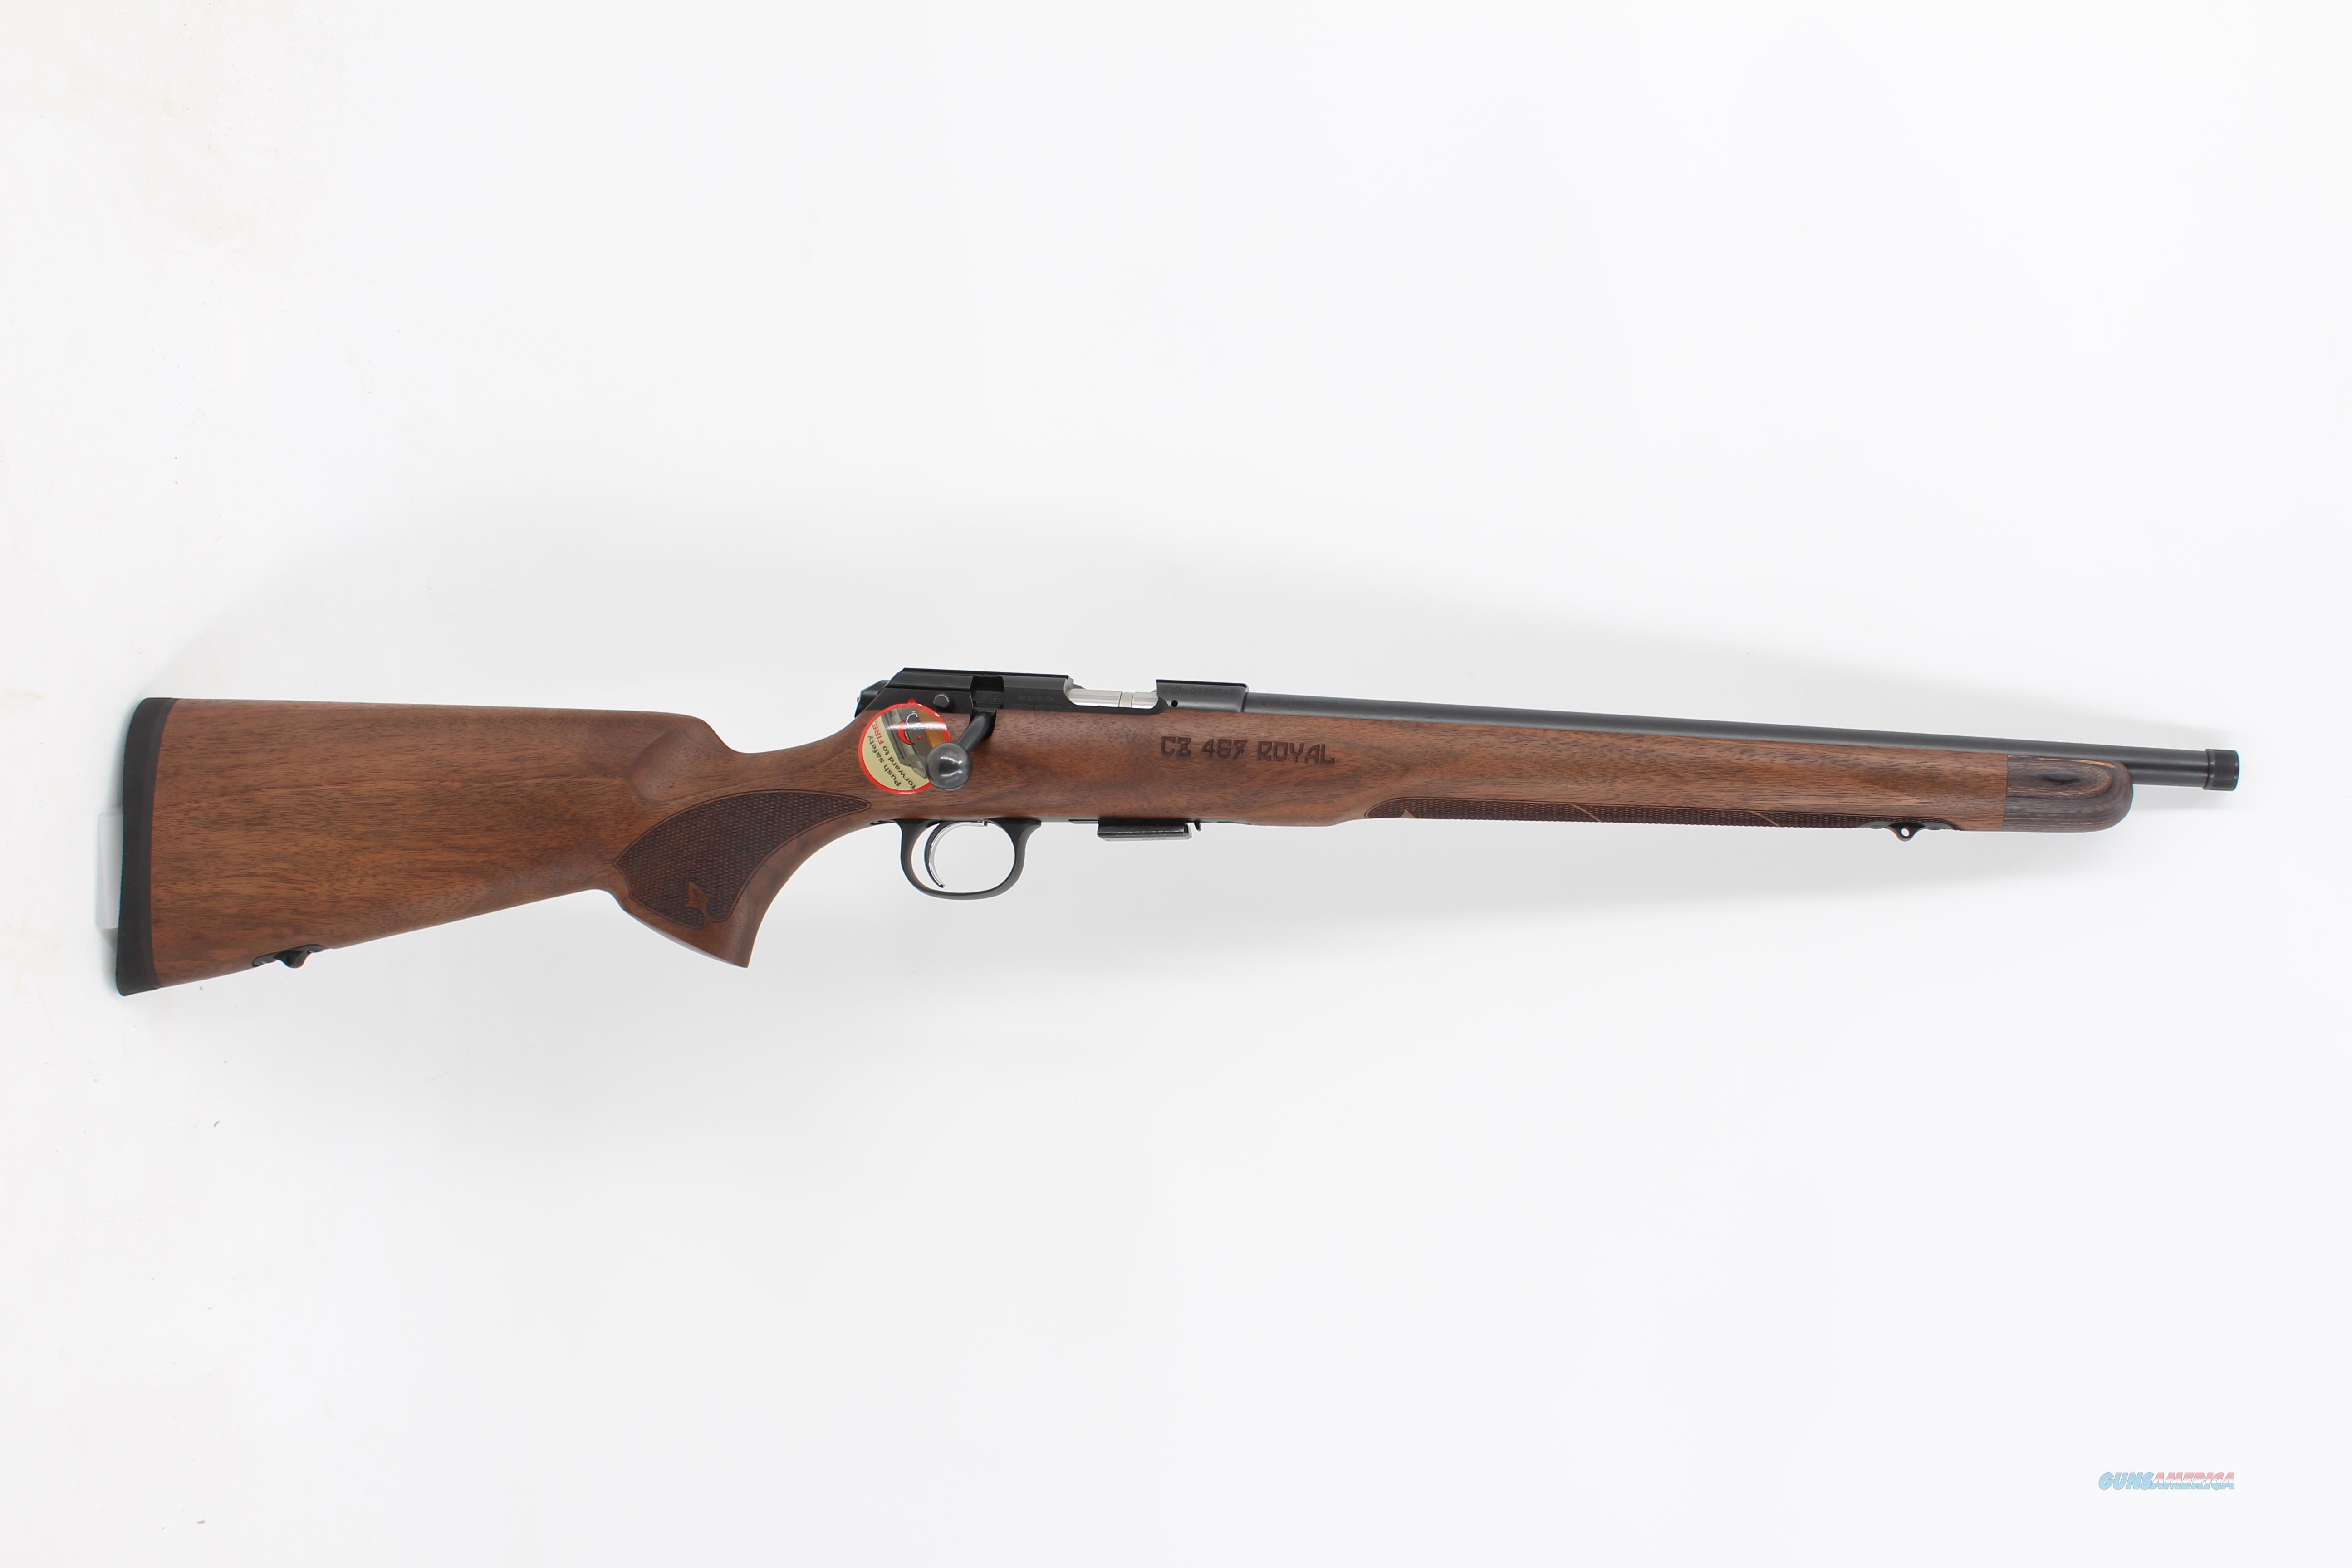 "CZ NIB 457 Royal 16"" Threaded Barrel  Guns > Rifles > CZ Rifles"